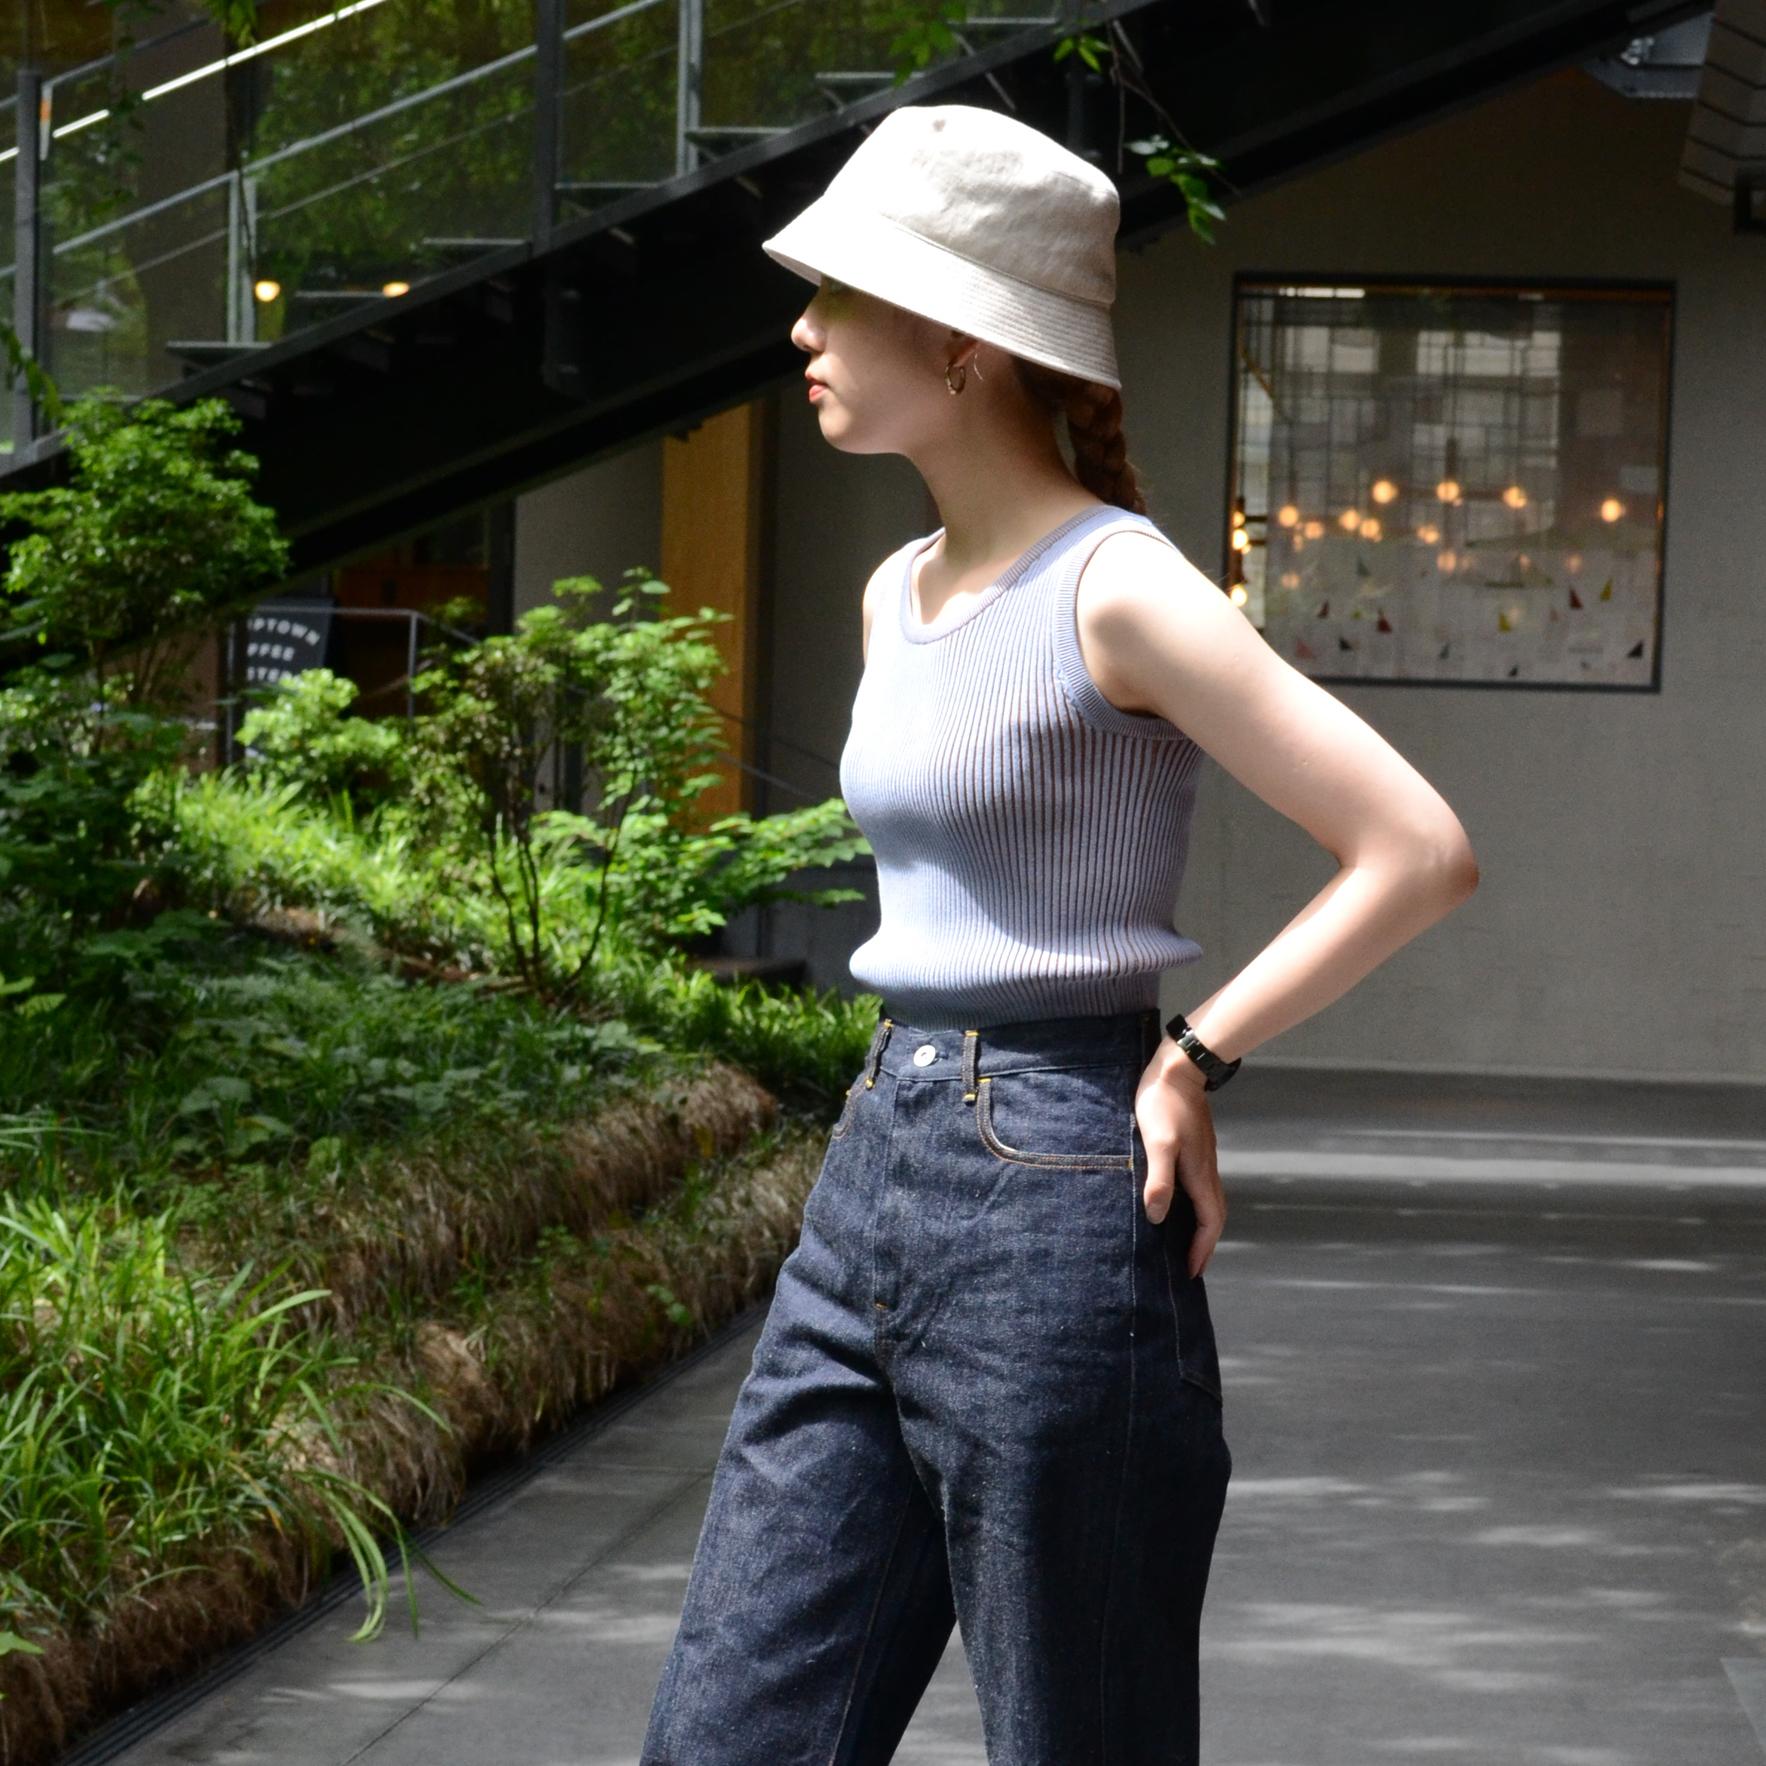 2021 Spring Summer Style Sample for Women -Vol.1-